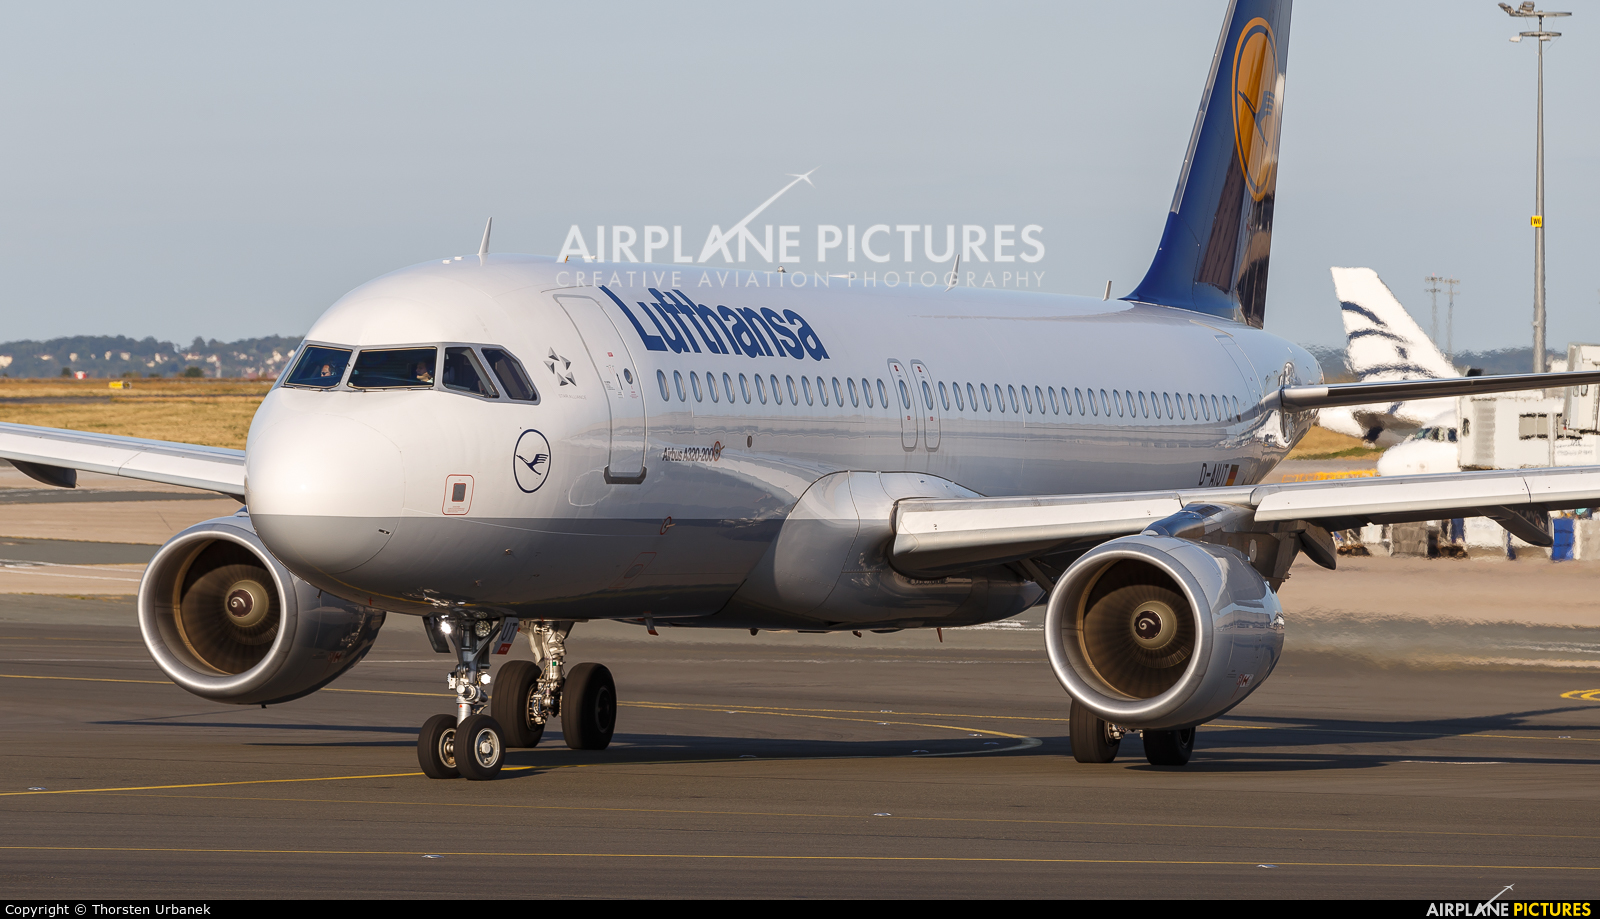 Lufthansa D-AIUT aircraft at Paris - Charles de Gaulle